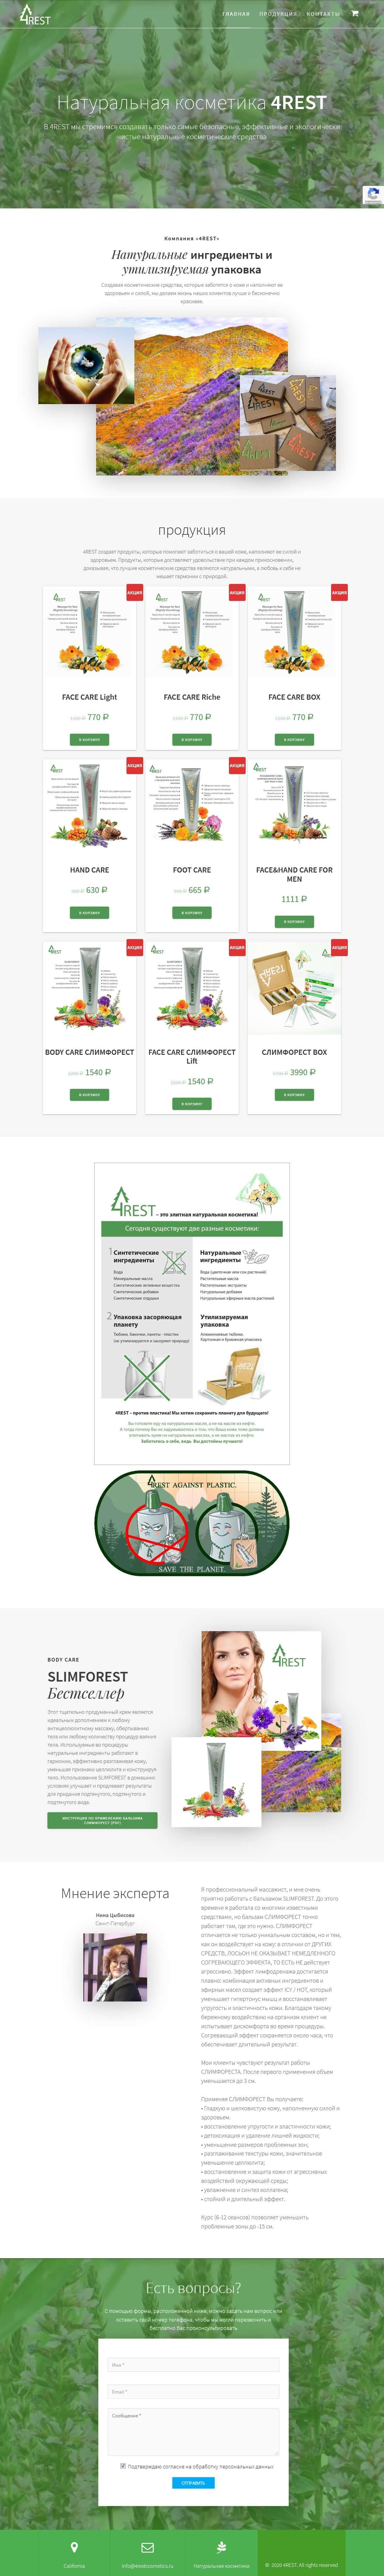 portfolio-4restcosmetics